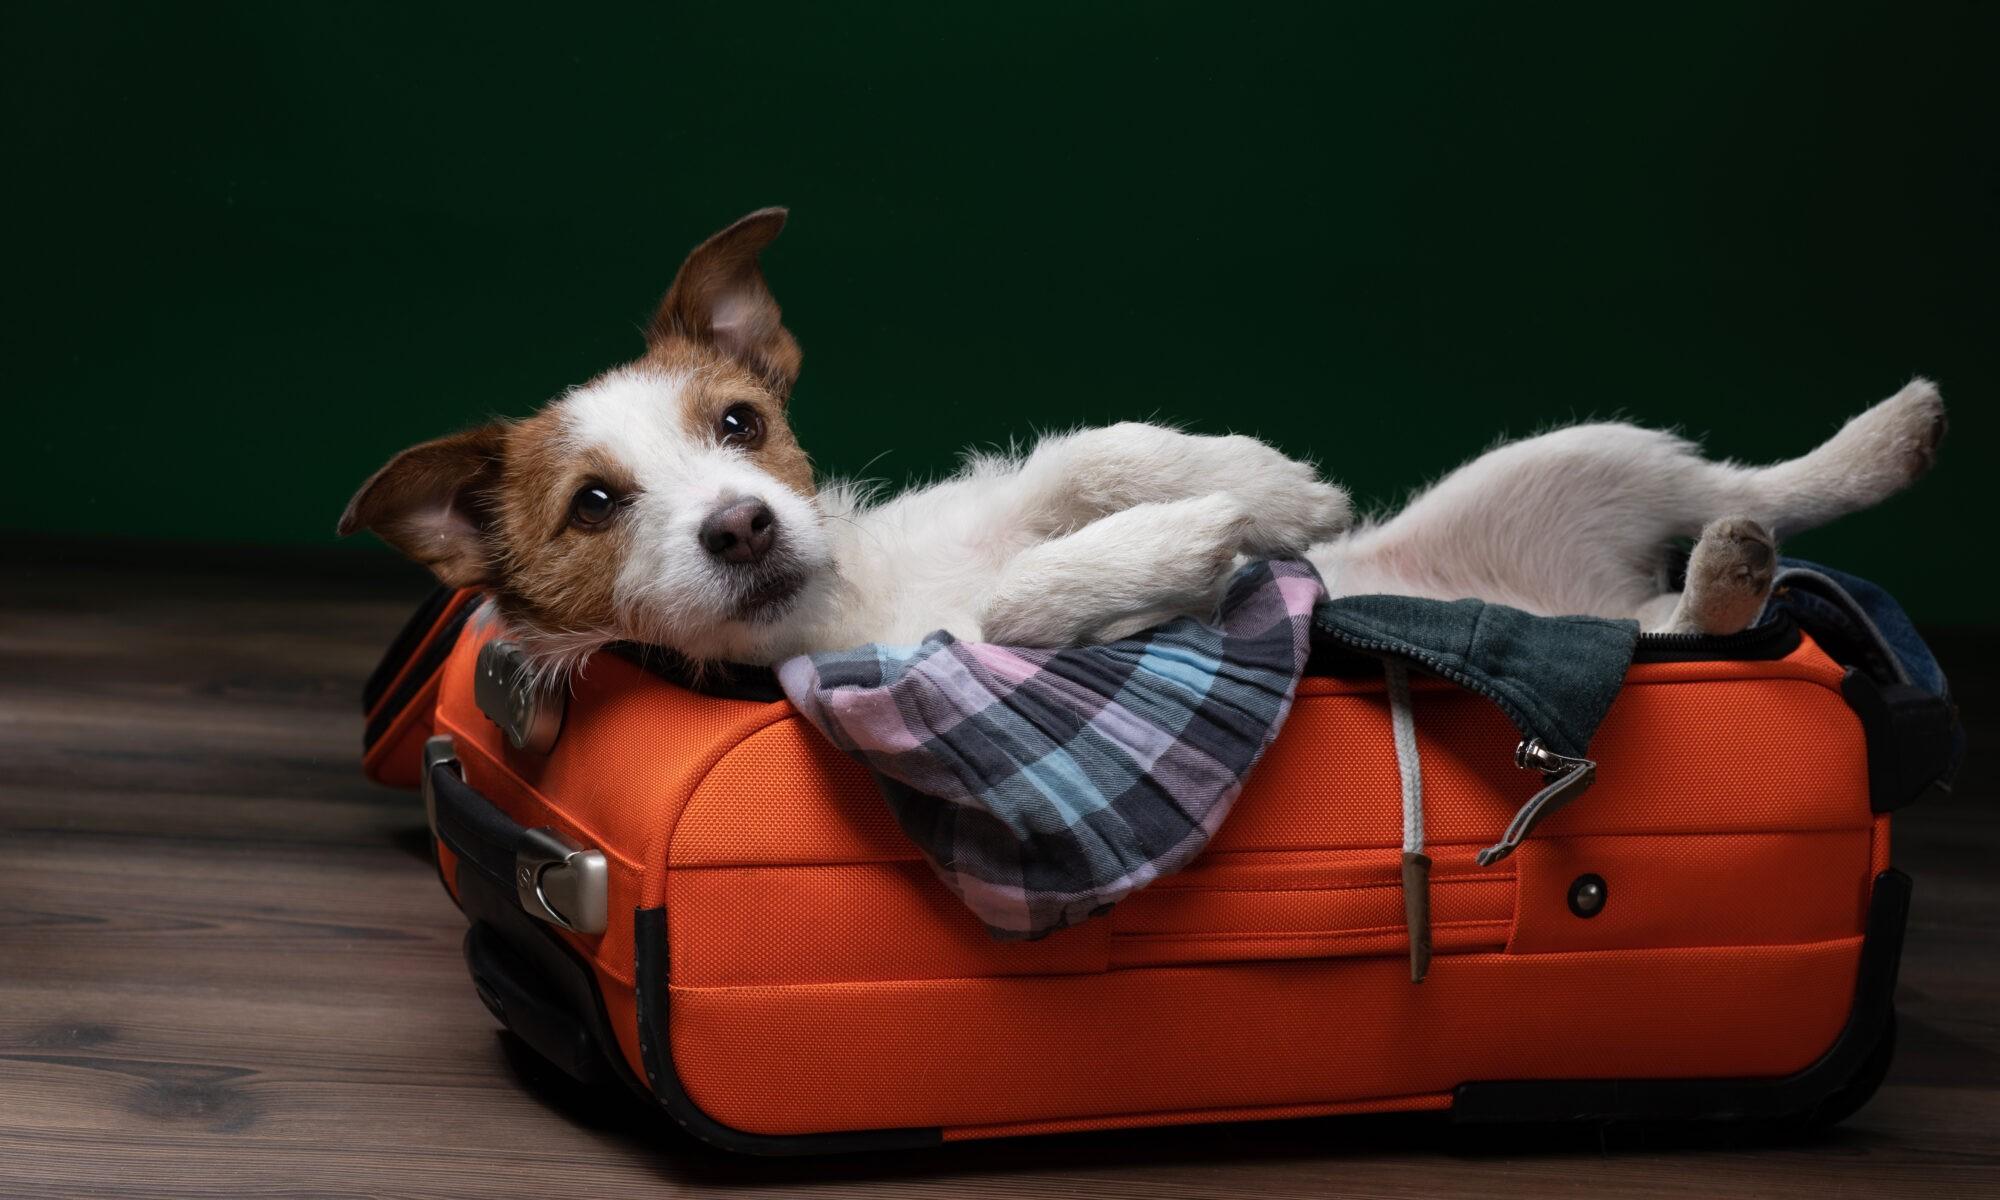 Canine Country Club & Feline Inn featuring a Jack Russell Terrier relaxing in Phoenix, AZ